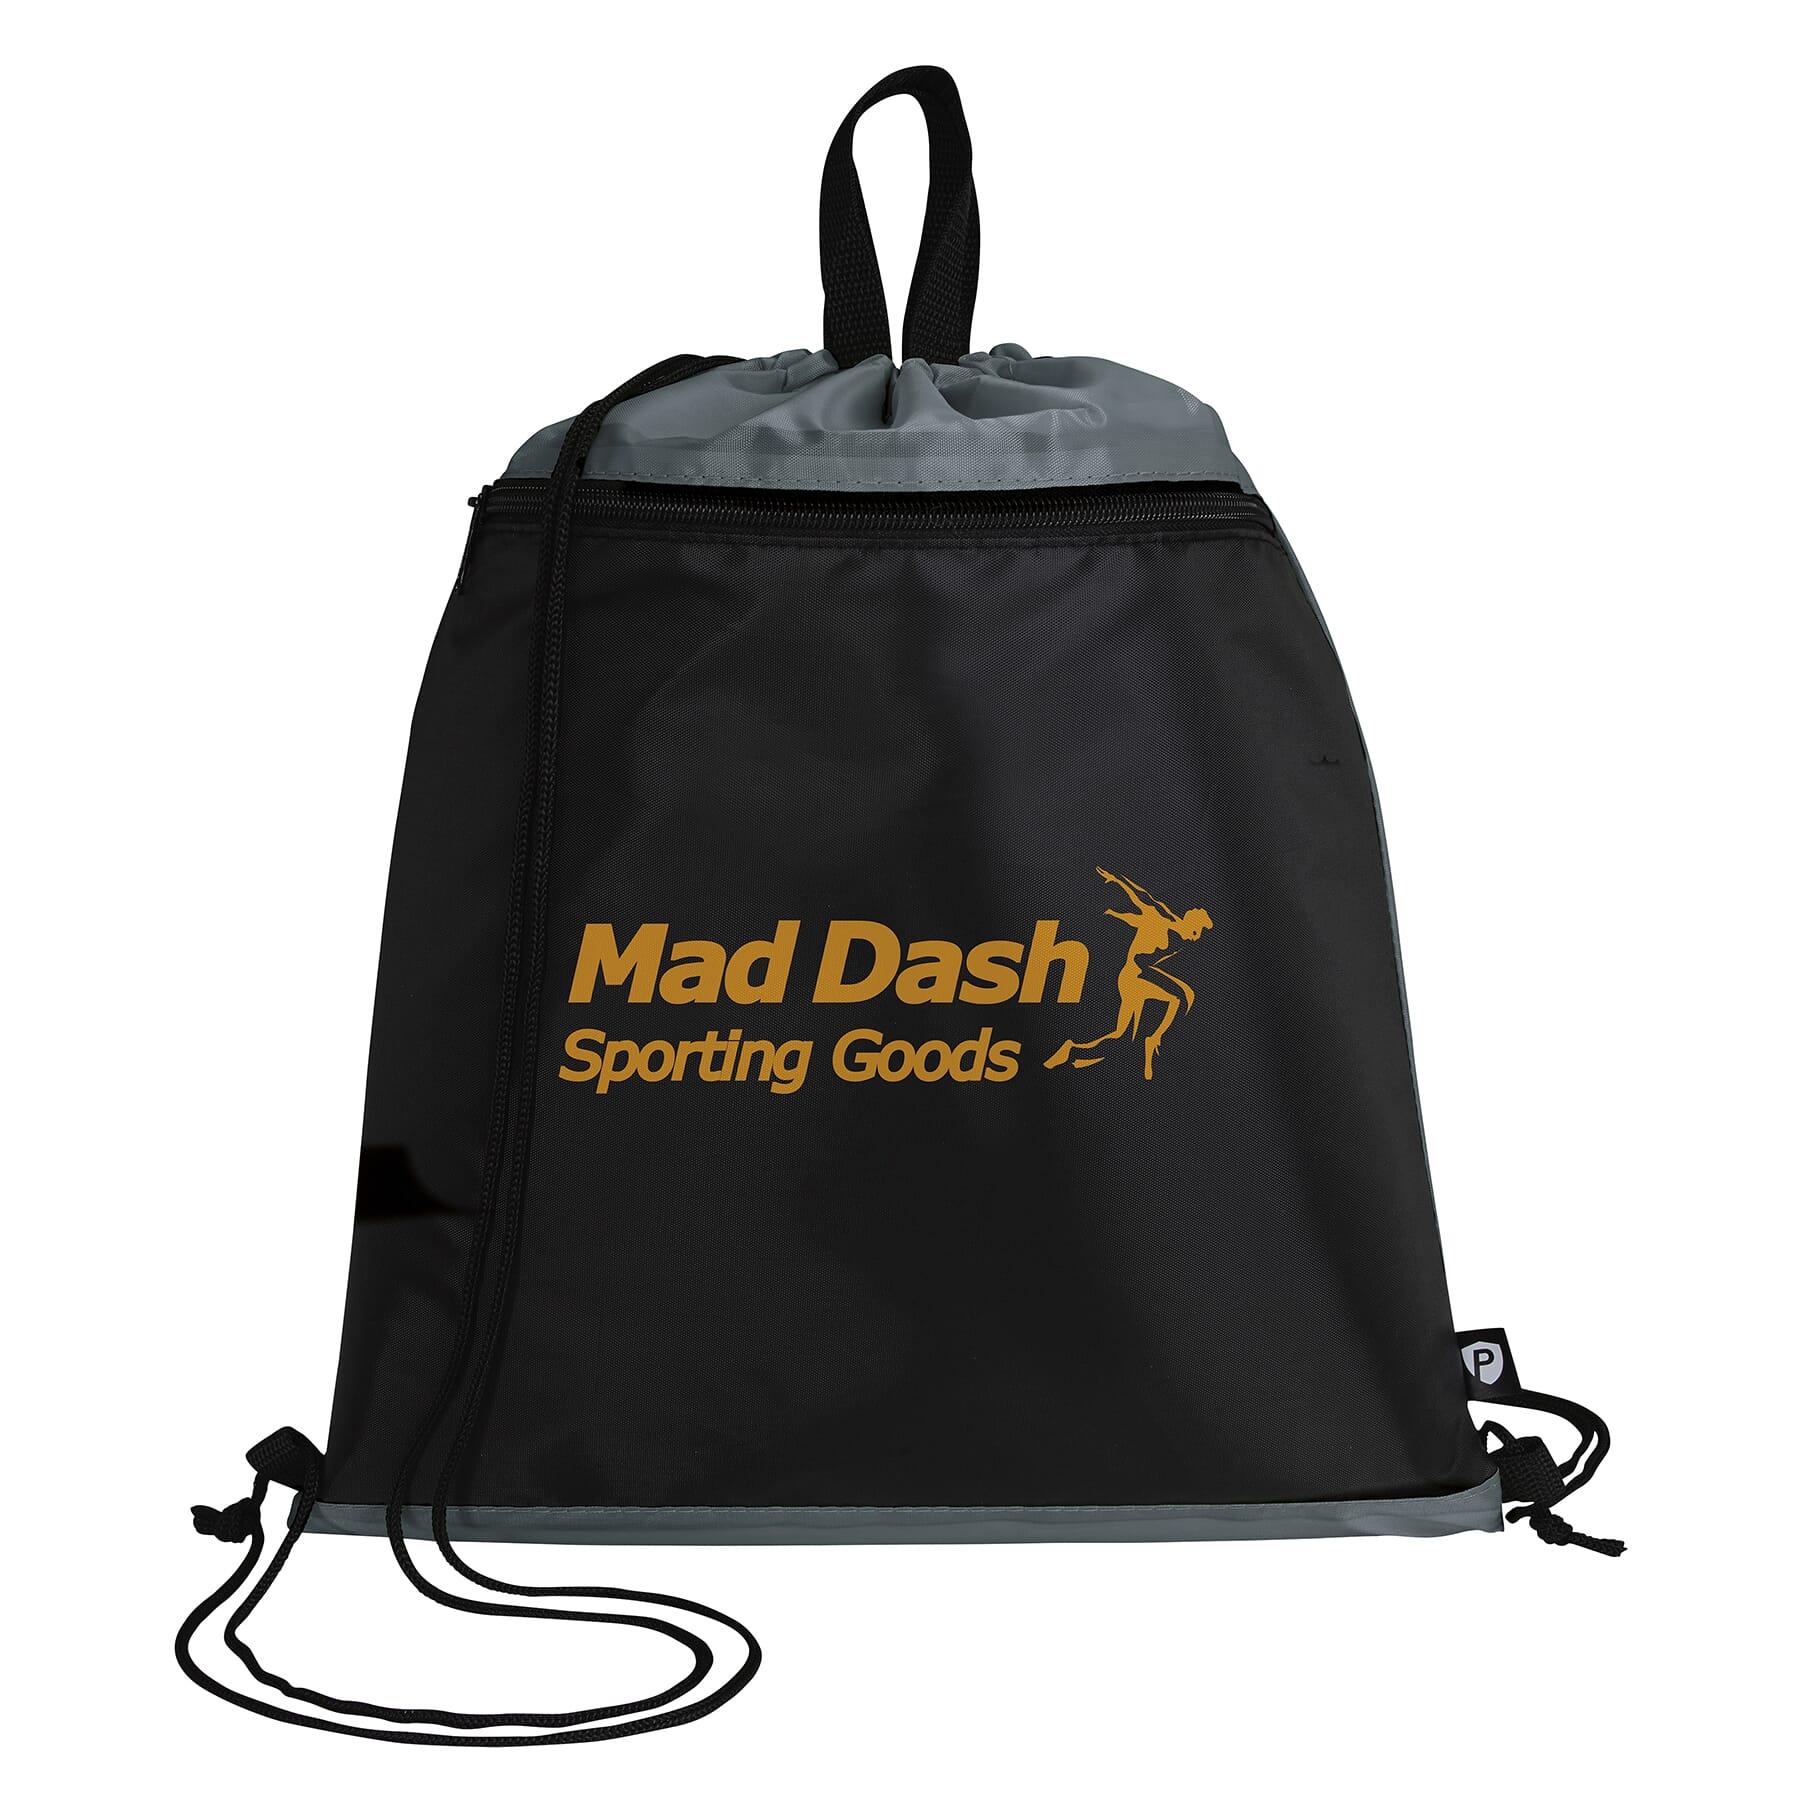 PrevaGuard™ Drawstring Backpack